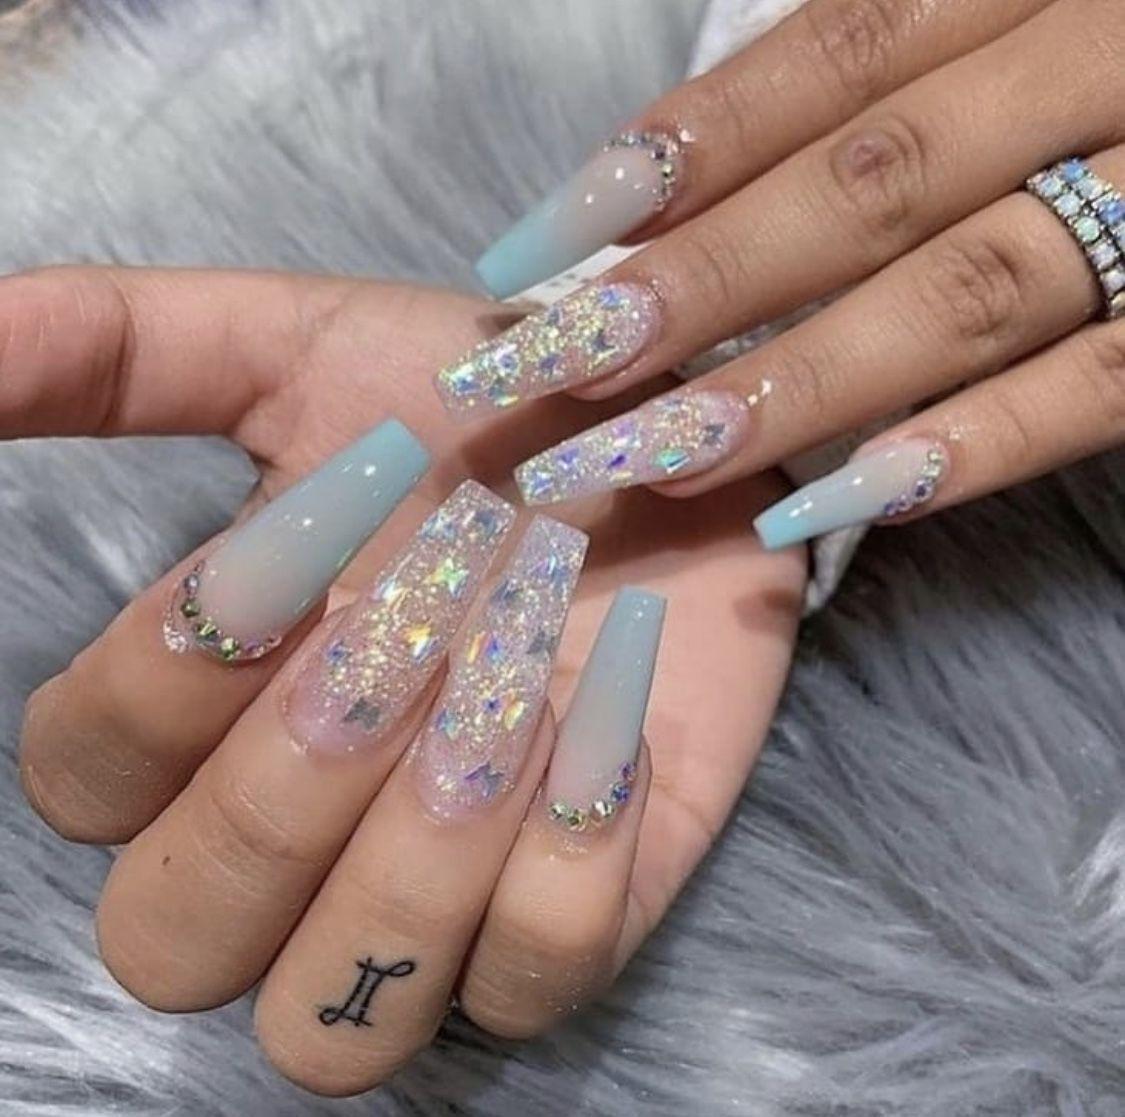 Pin By Arianna Orlando On Nailz In 2020 Best Acrylic Nails Blue Acrylic Nails Swag Nails